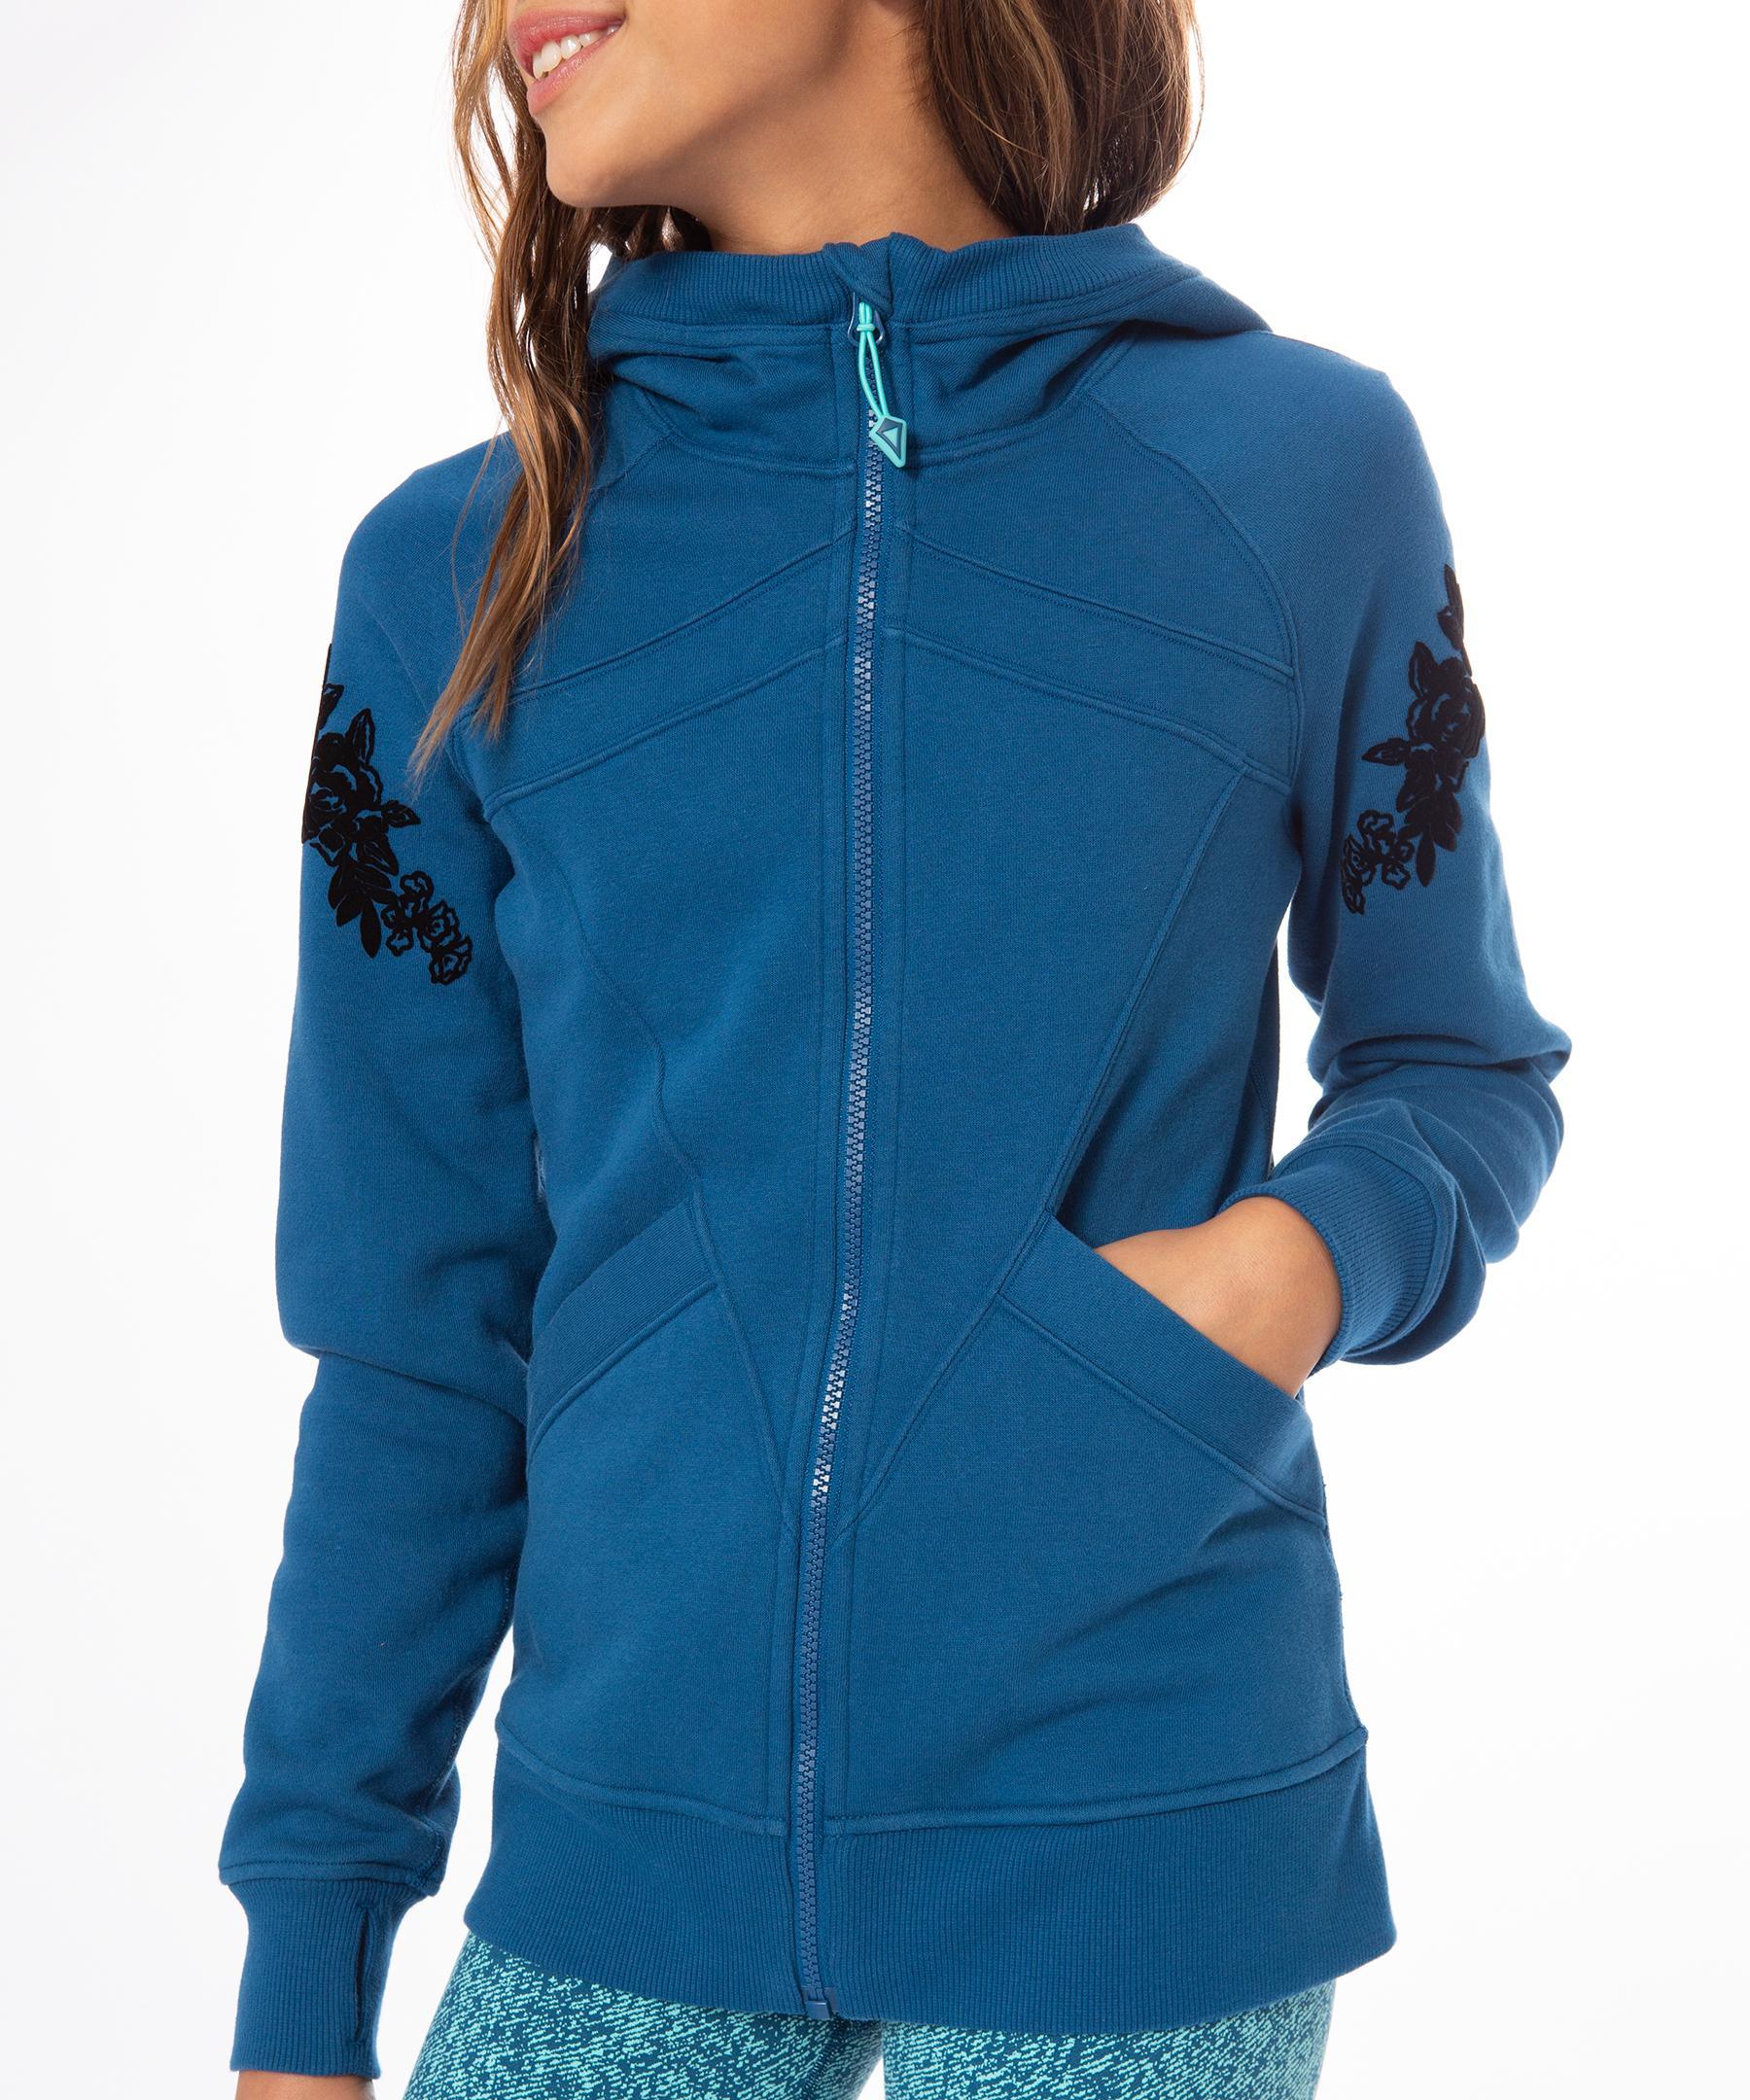 880b5c84268505 Lyst - lululemon athletica The Ivivva Hoodie - Girls in Blue - Save 46%